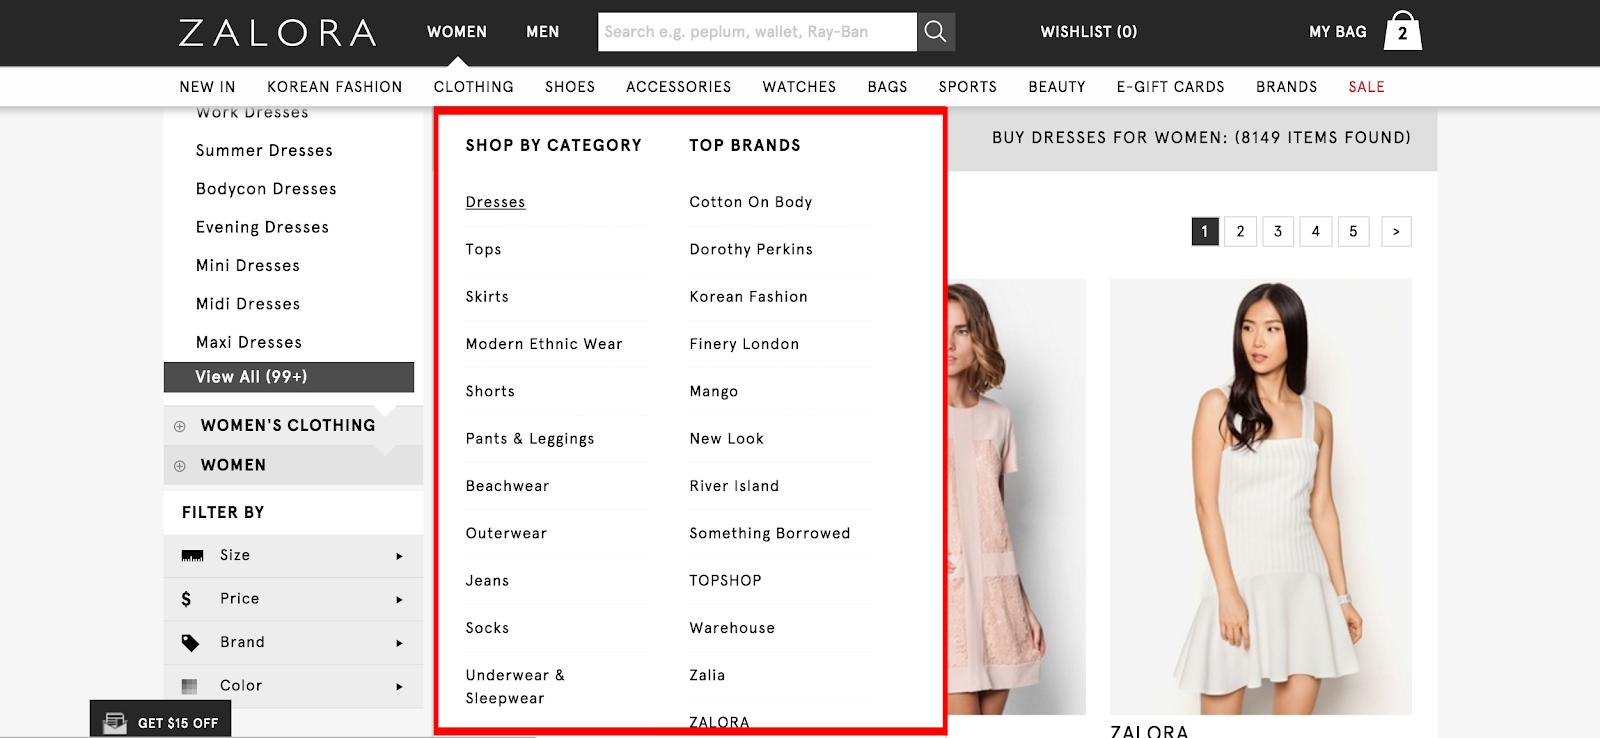 Zalora product category